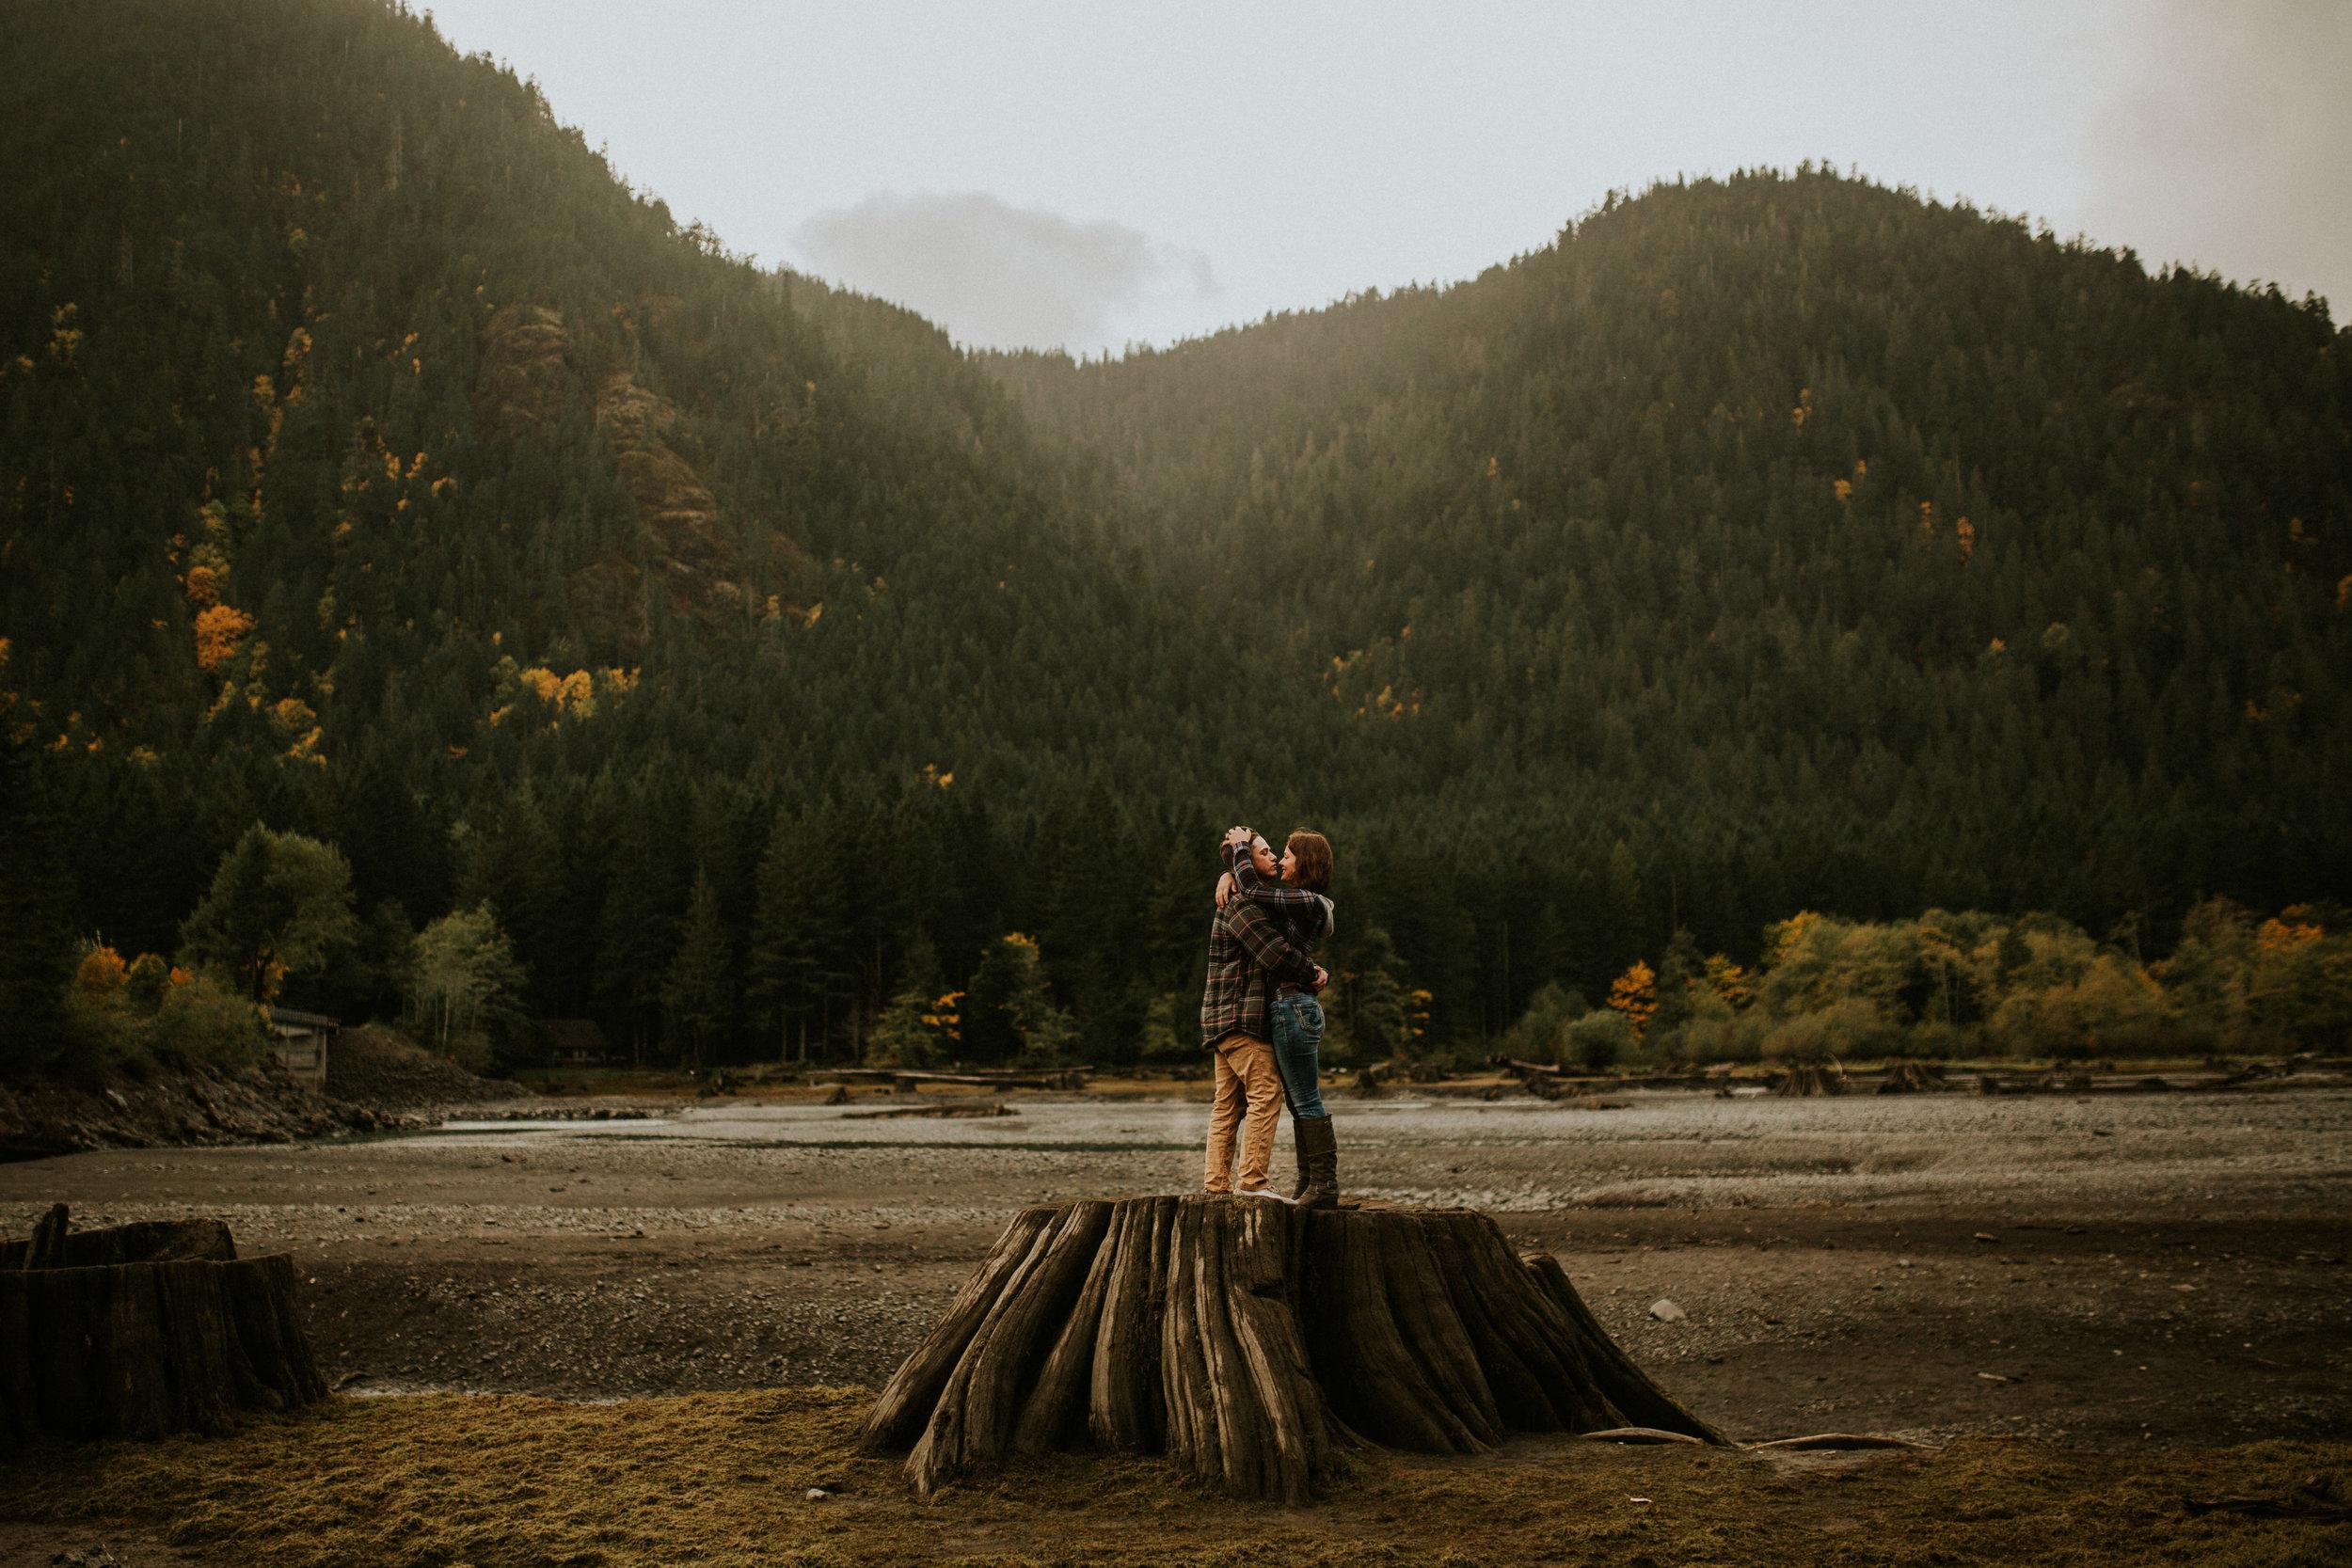 Lake-Cushman-Adventure-Engagement-photographer-breeanna-lasher-19.jpg